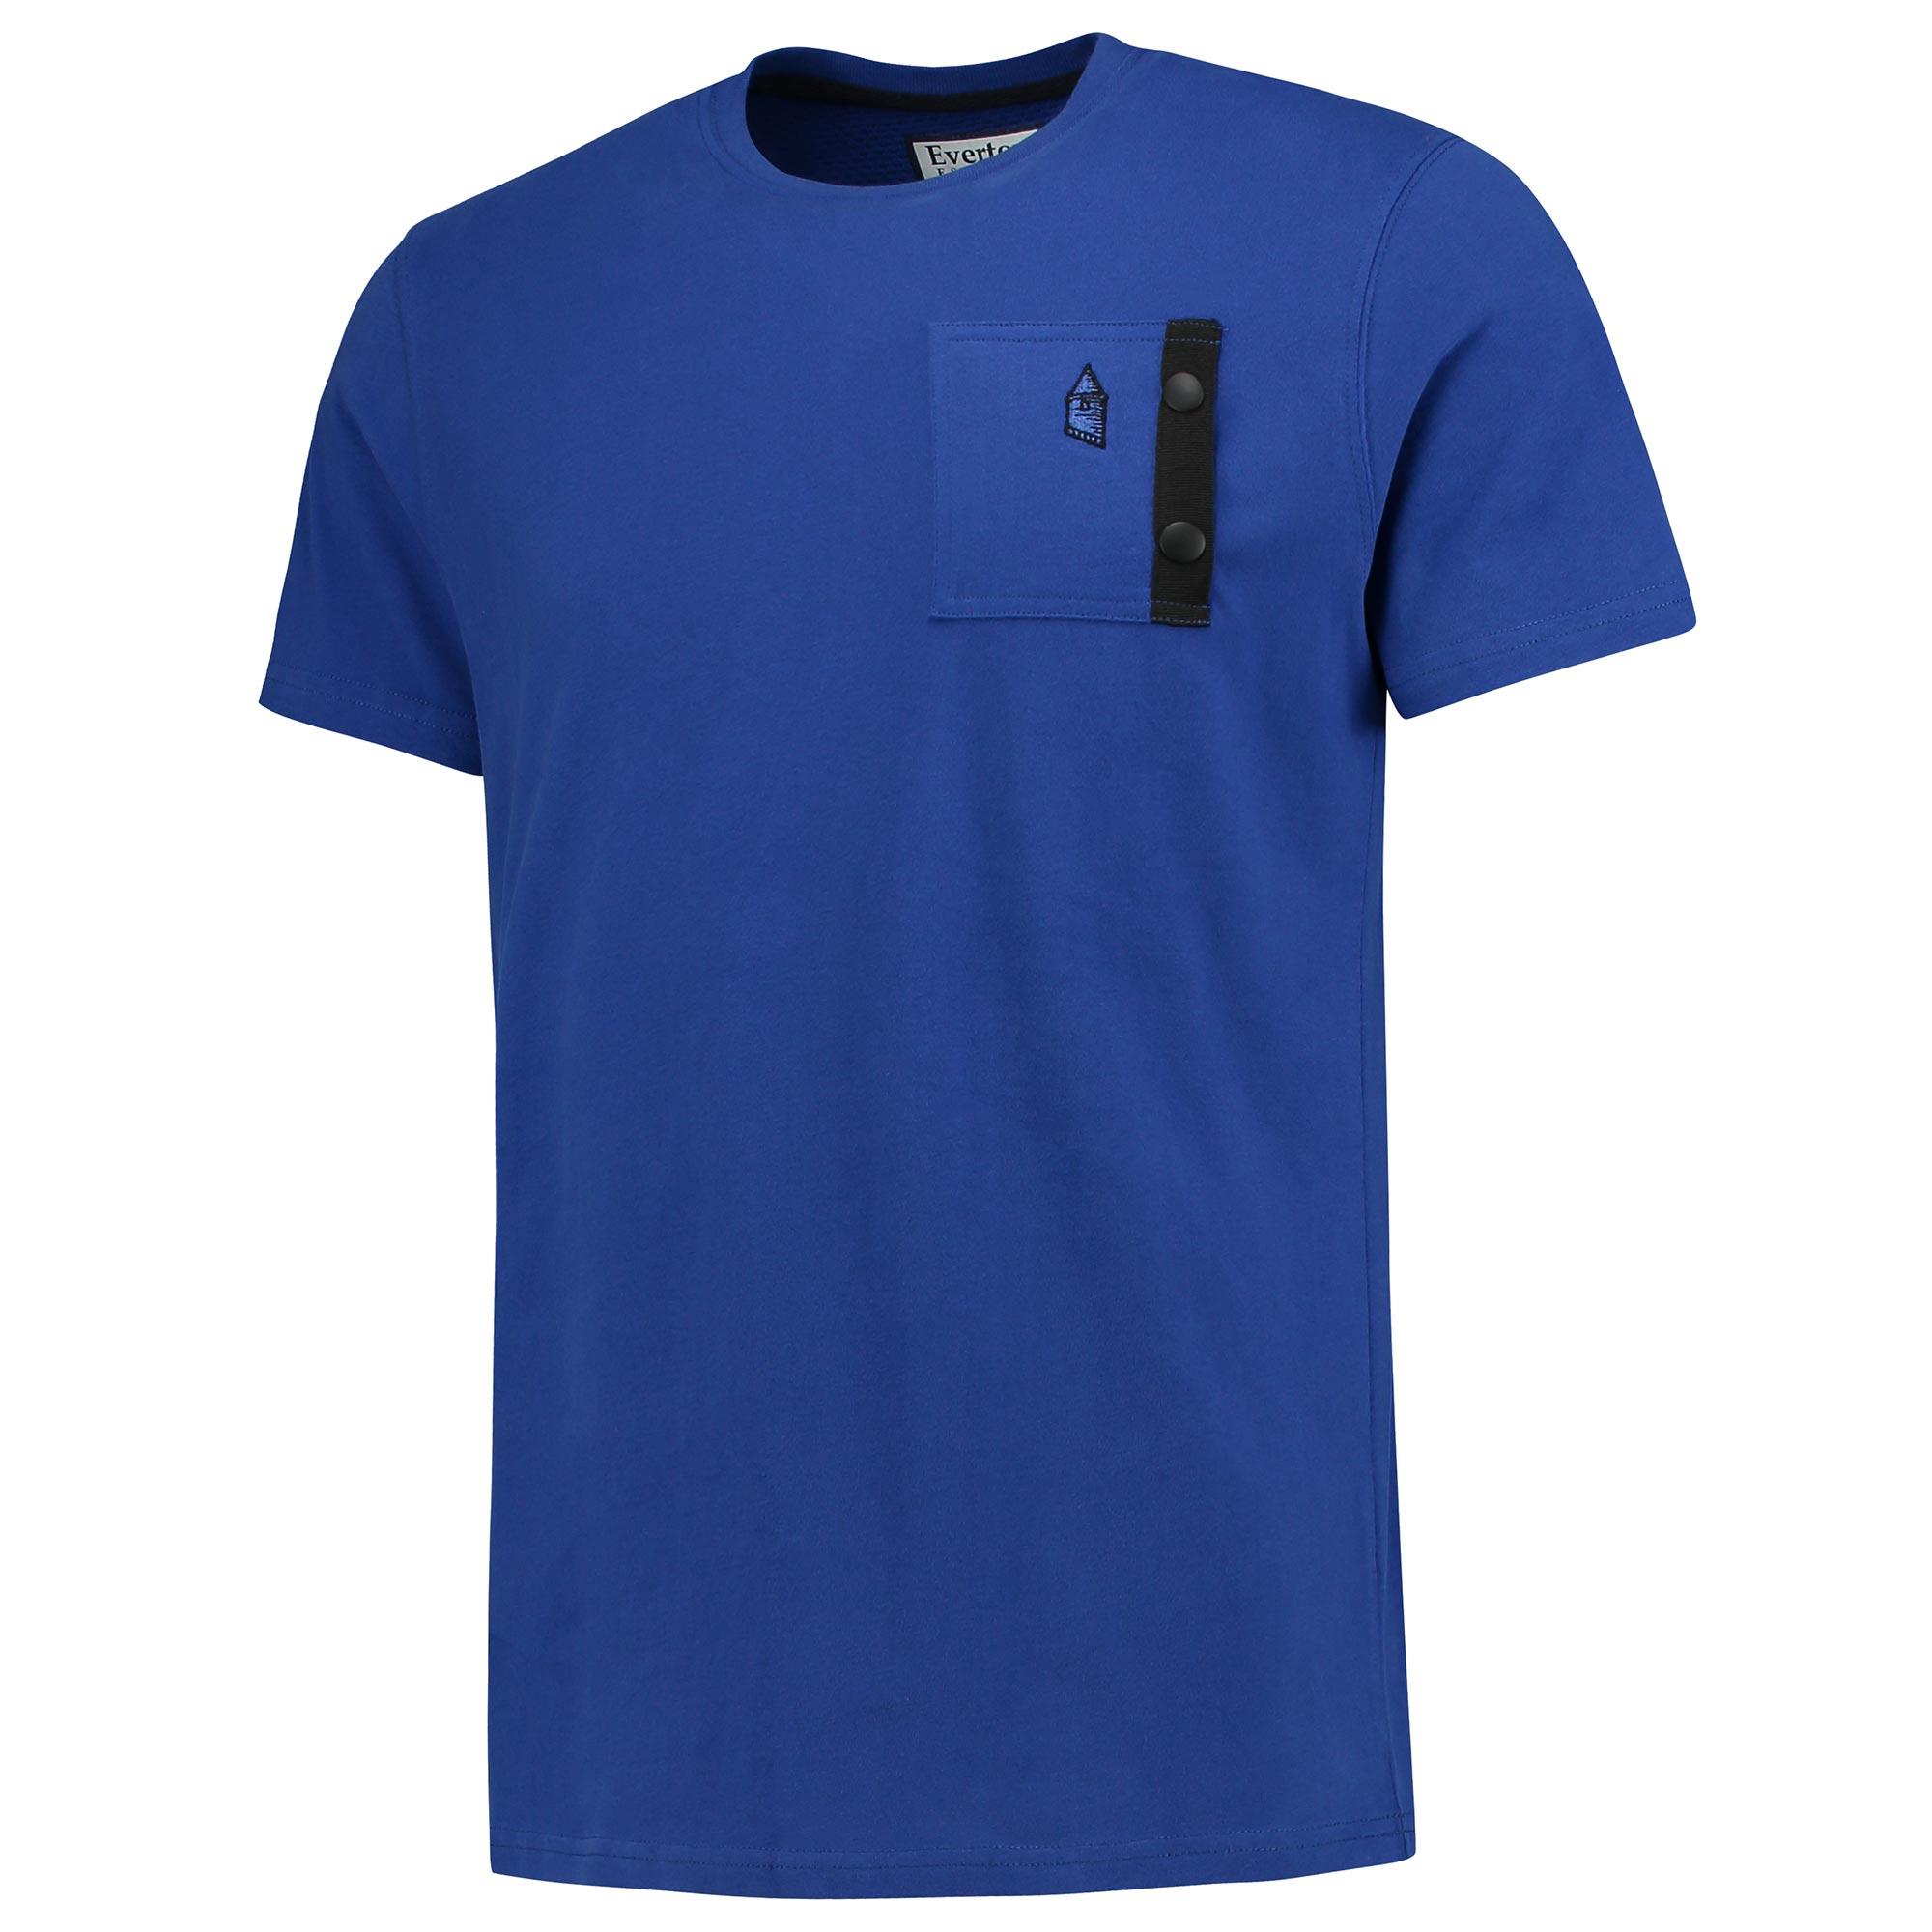 Everton Terrace T-Shirt - Royal